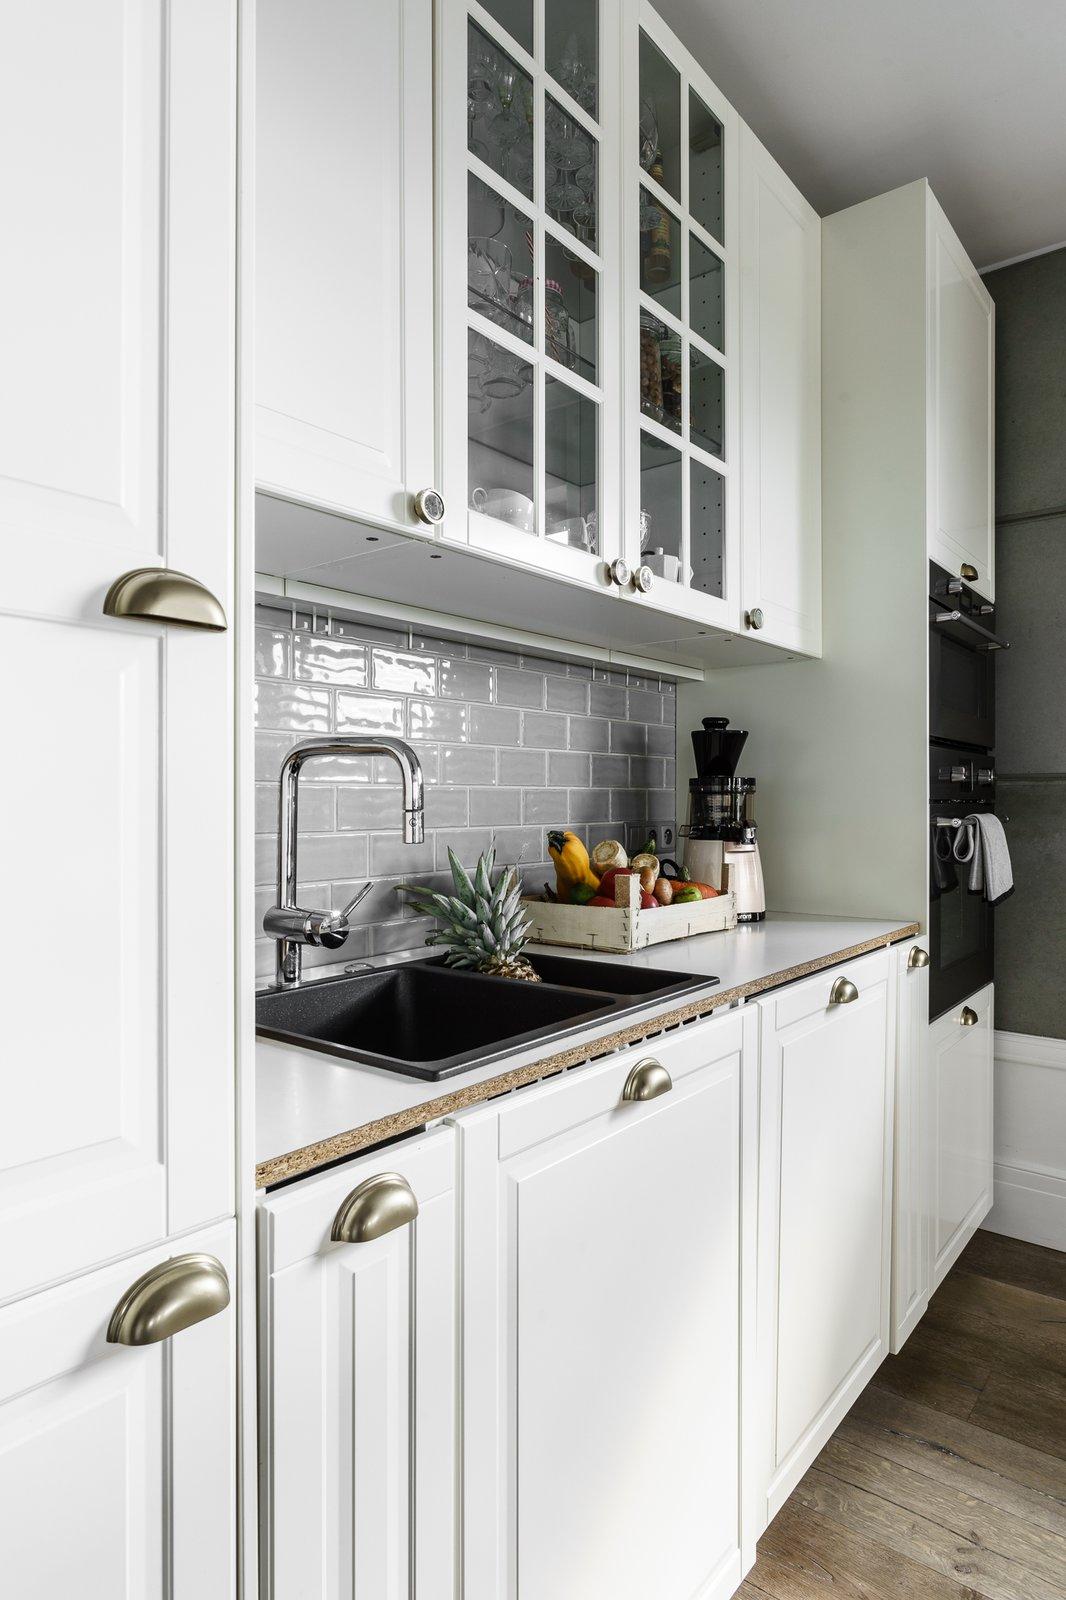 Tagged: Kitchen, Subway Tile Backsplashe, Glass Tile Backsplashe, White Cabinet, and Drop In Sink.  Loft in Poland